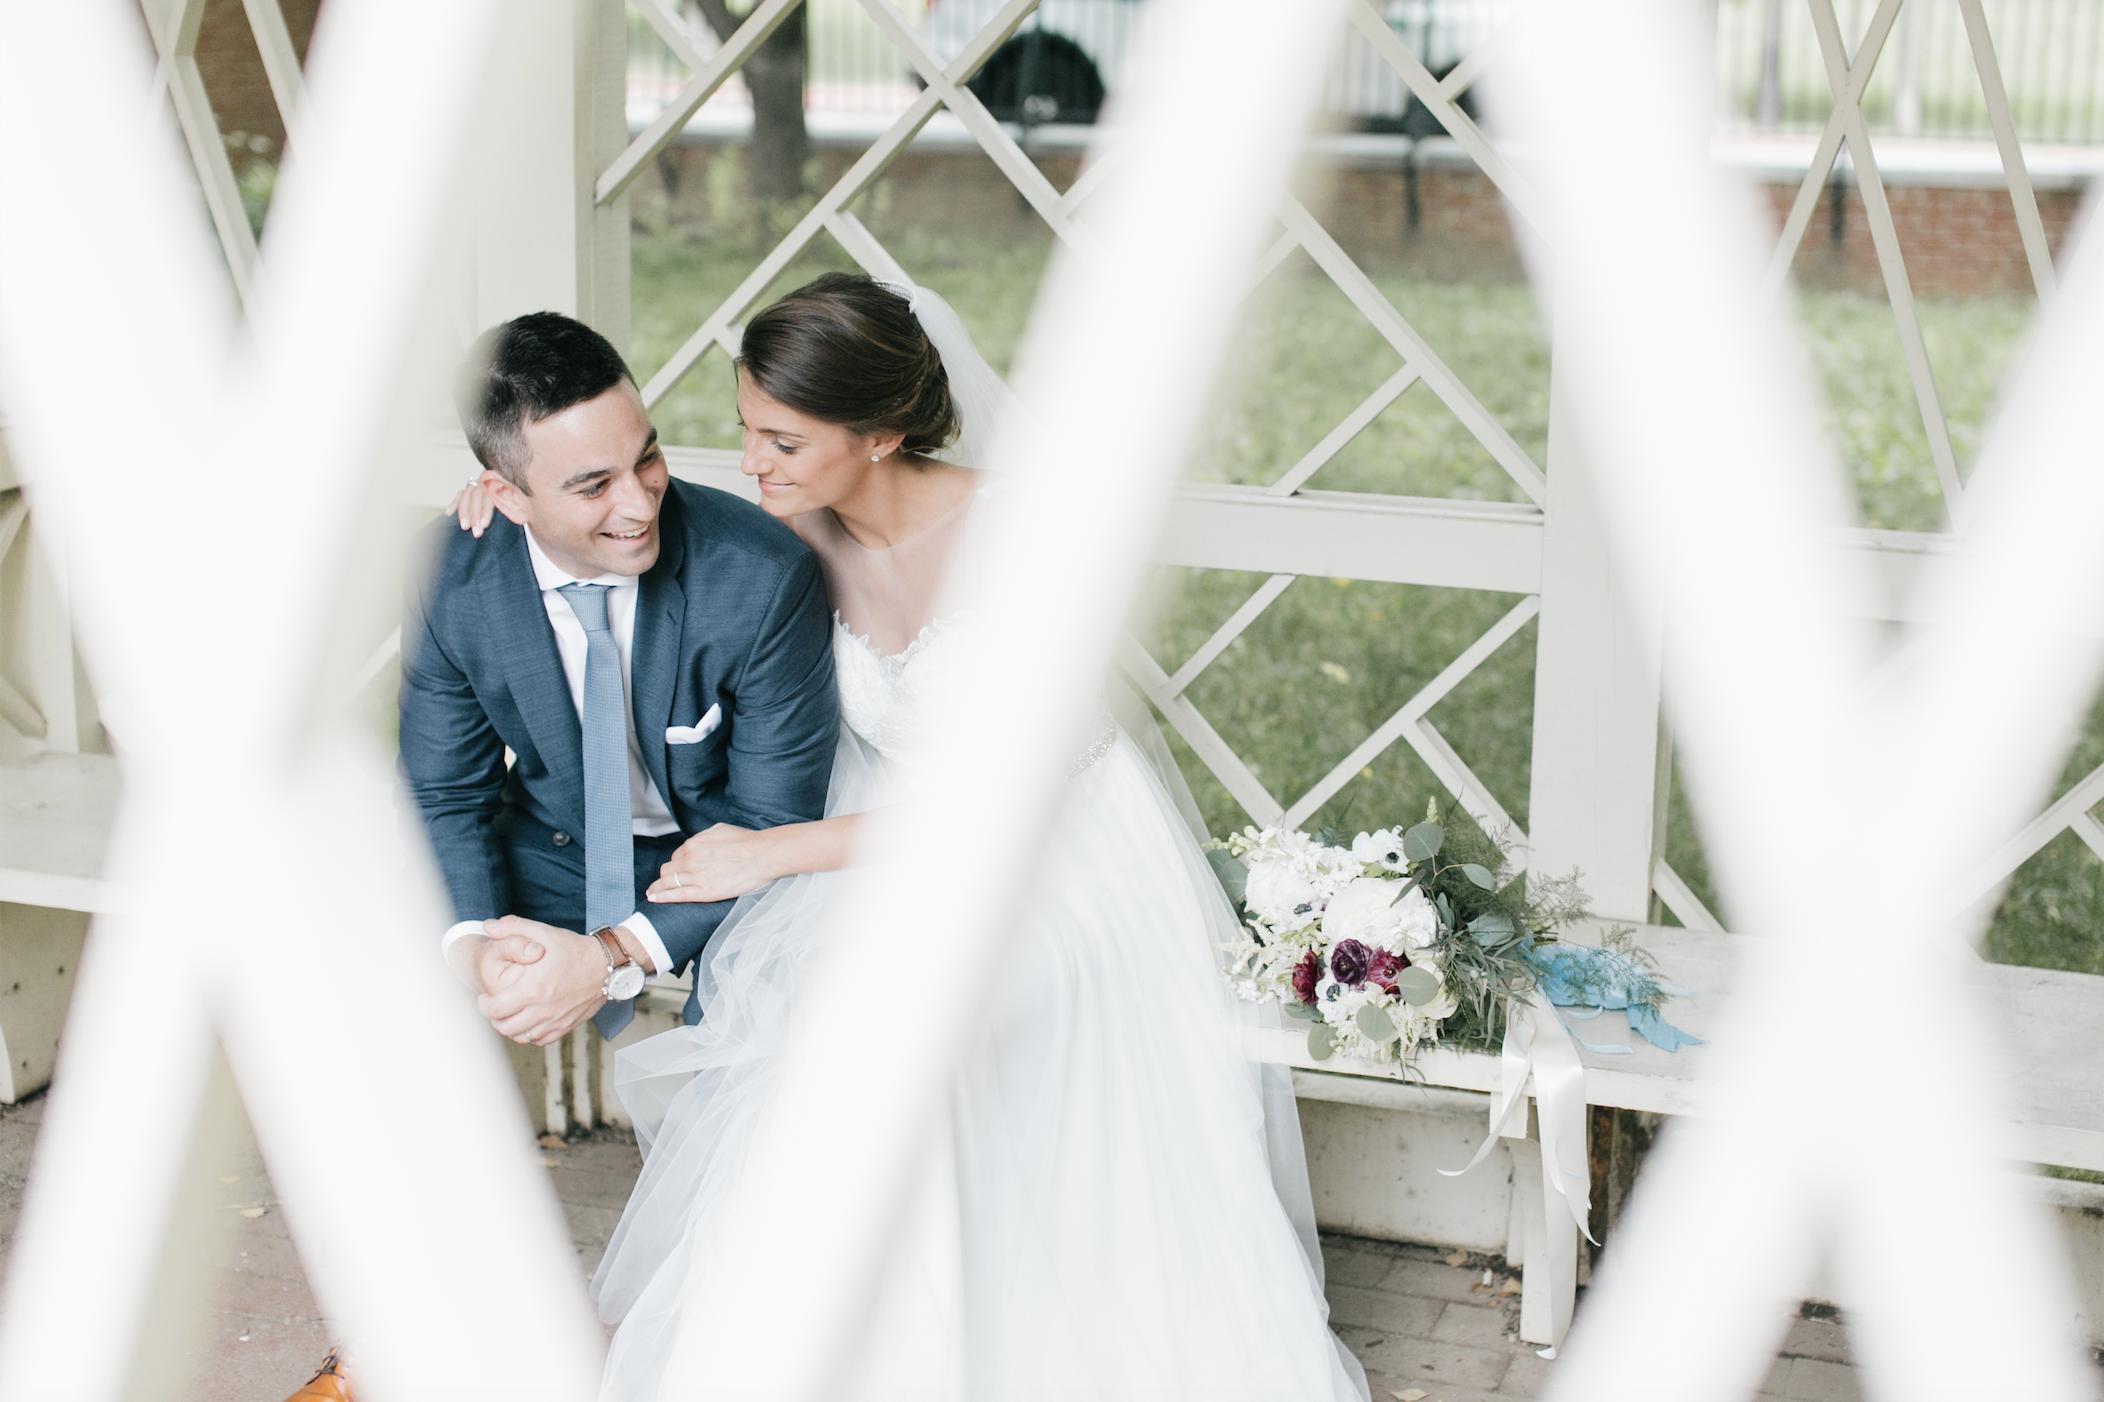 Jen + Billy's Philadelphia wedding // photo by Emily Wren Photography